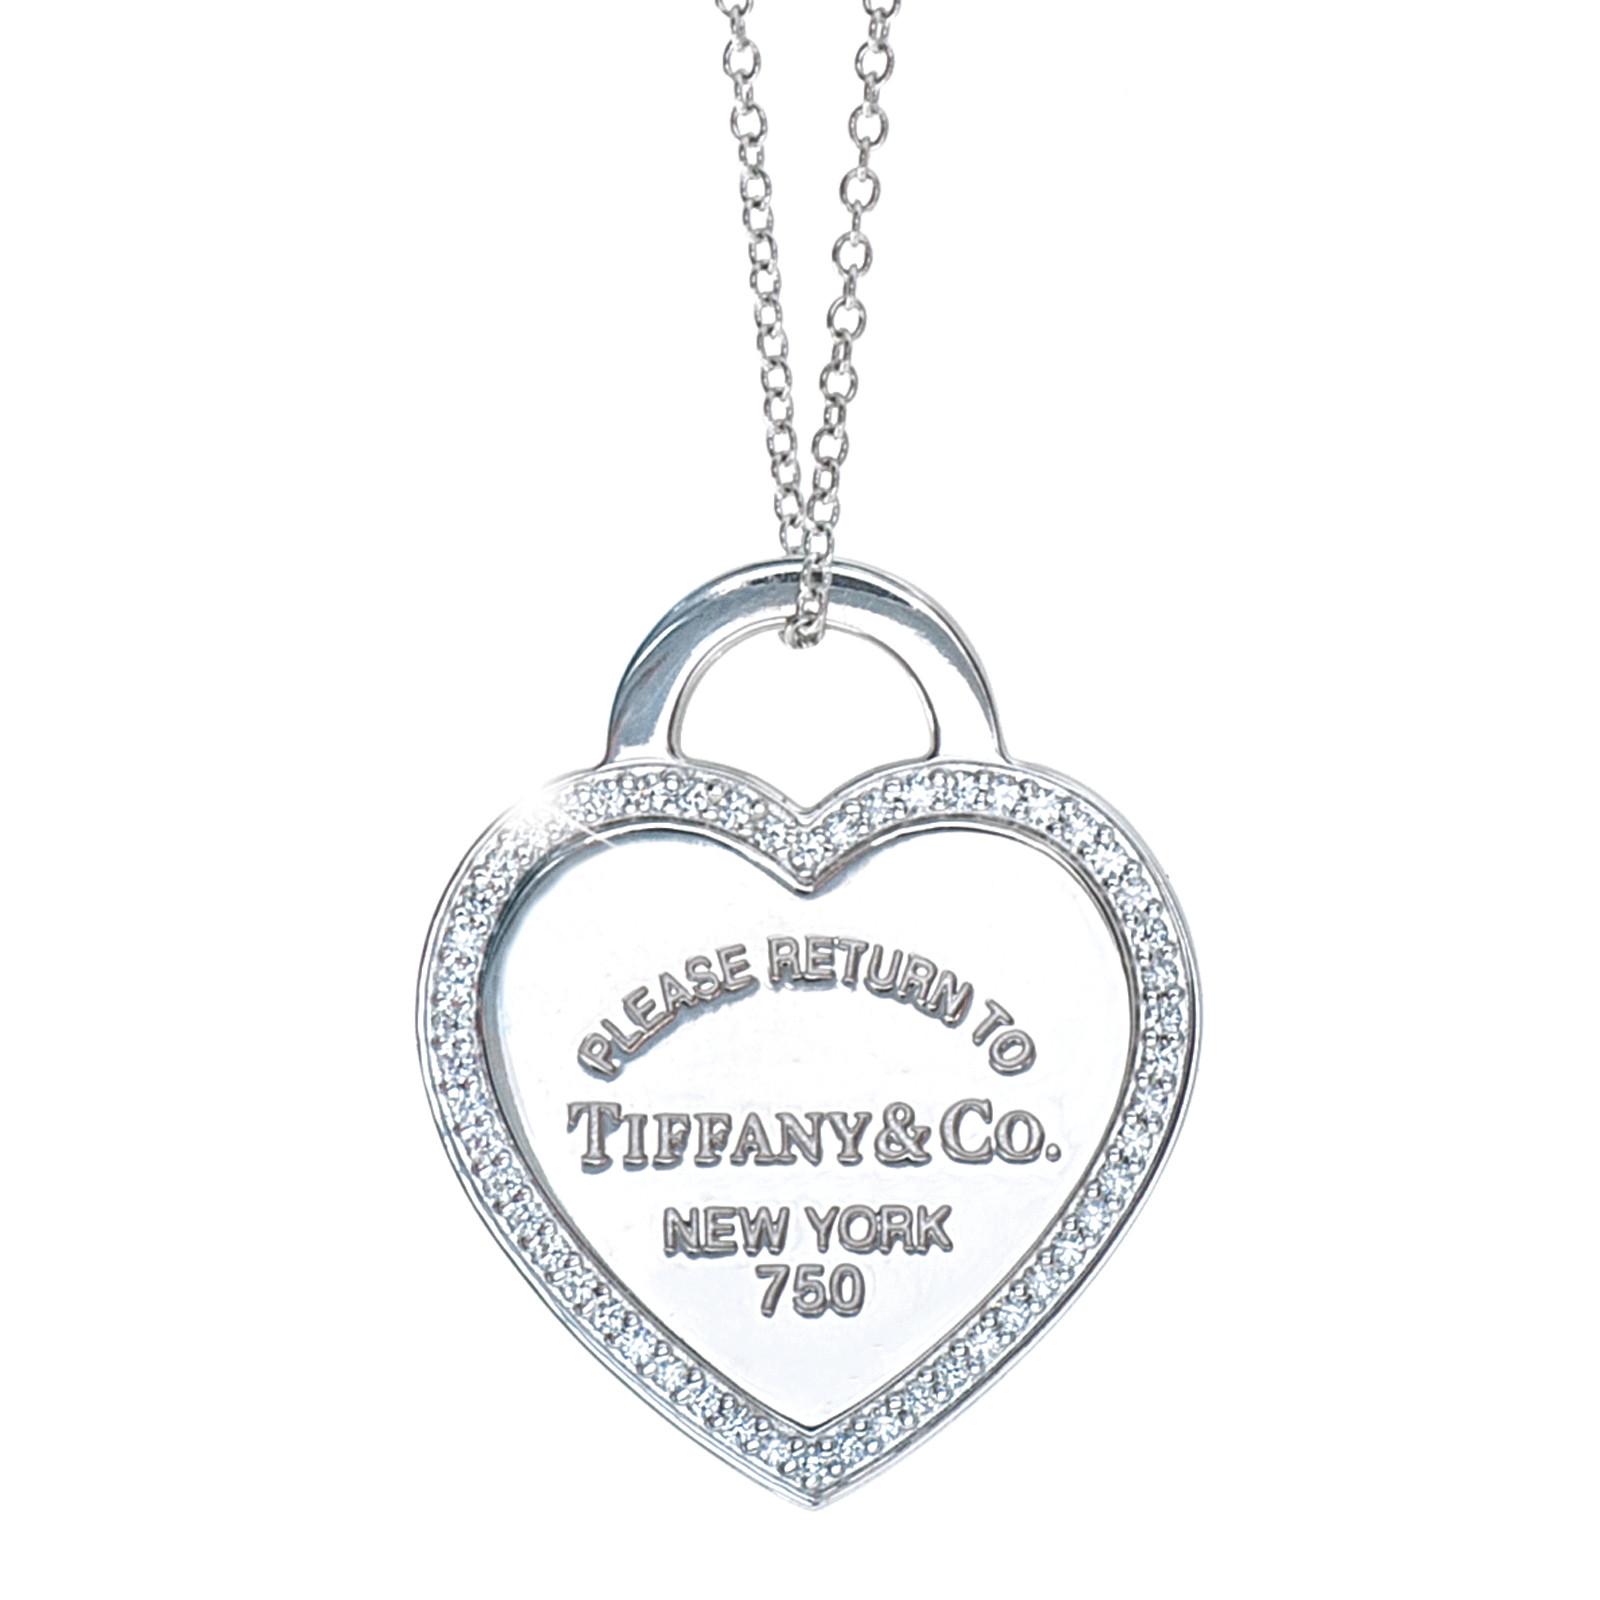 Vintage Tiffany & Co. Return to Tiffany Heart Tag Necklace